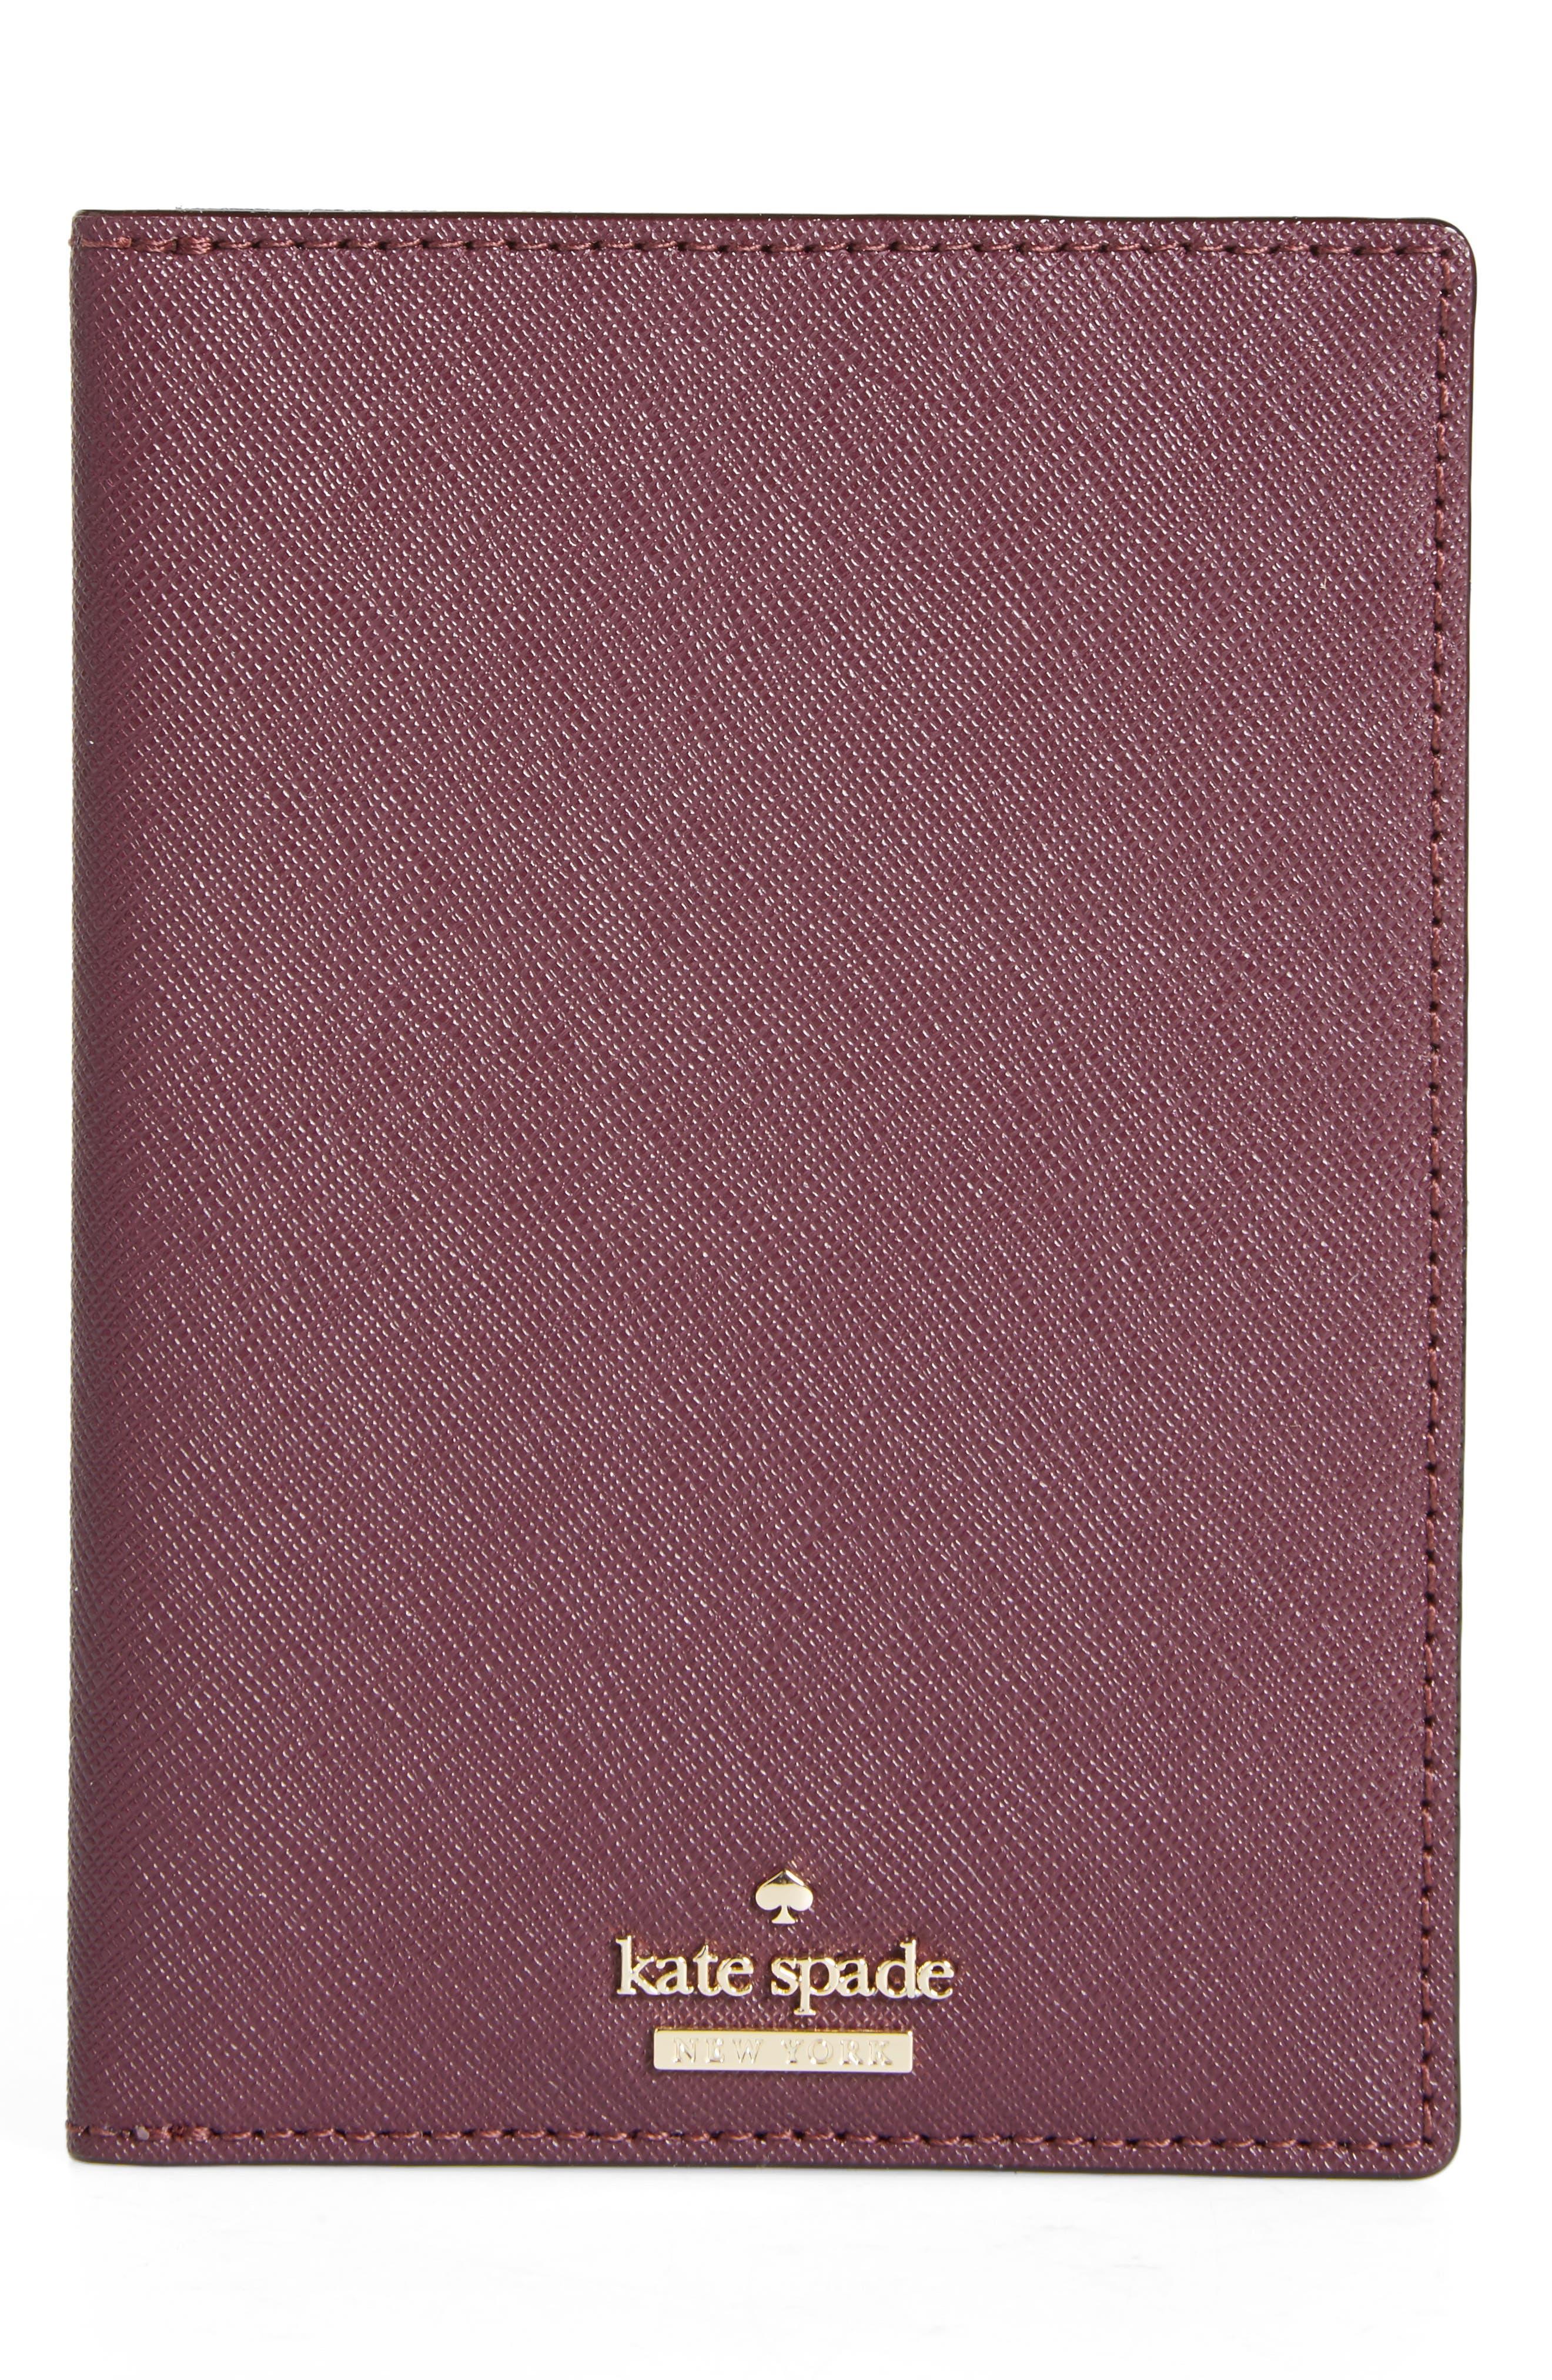 kate spade new york 'cameron street' leather passport holder